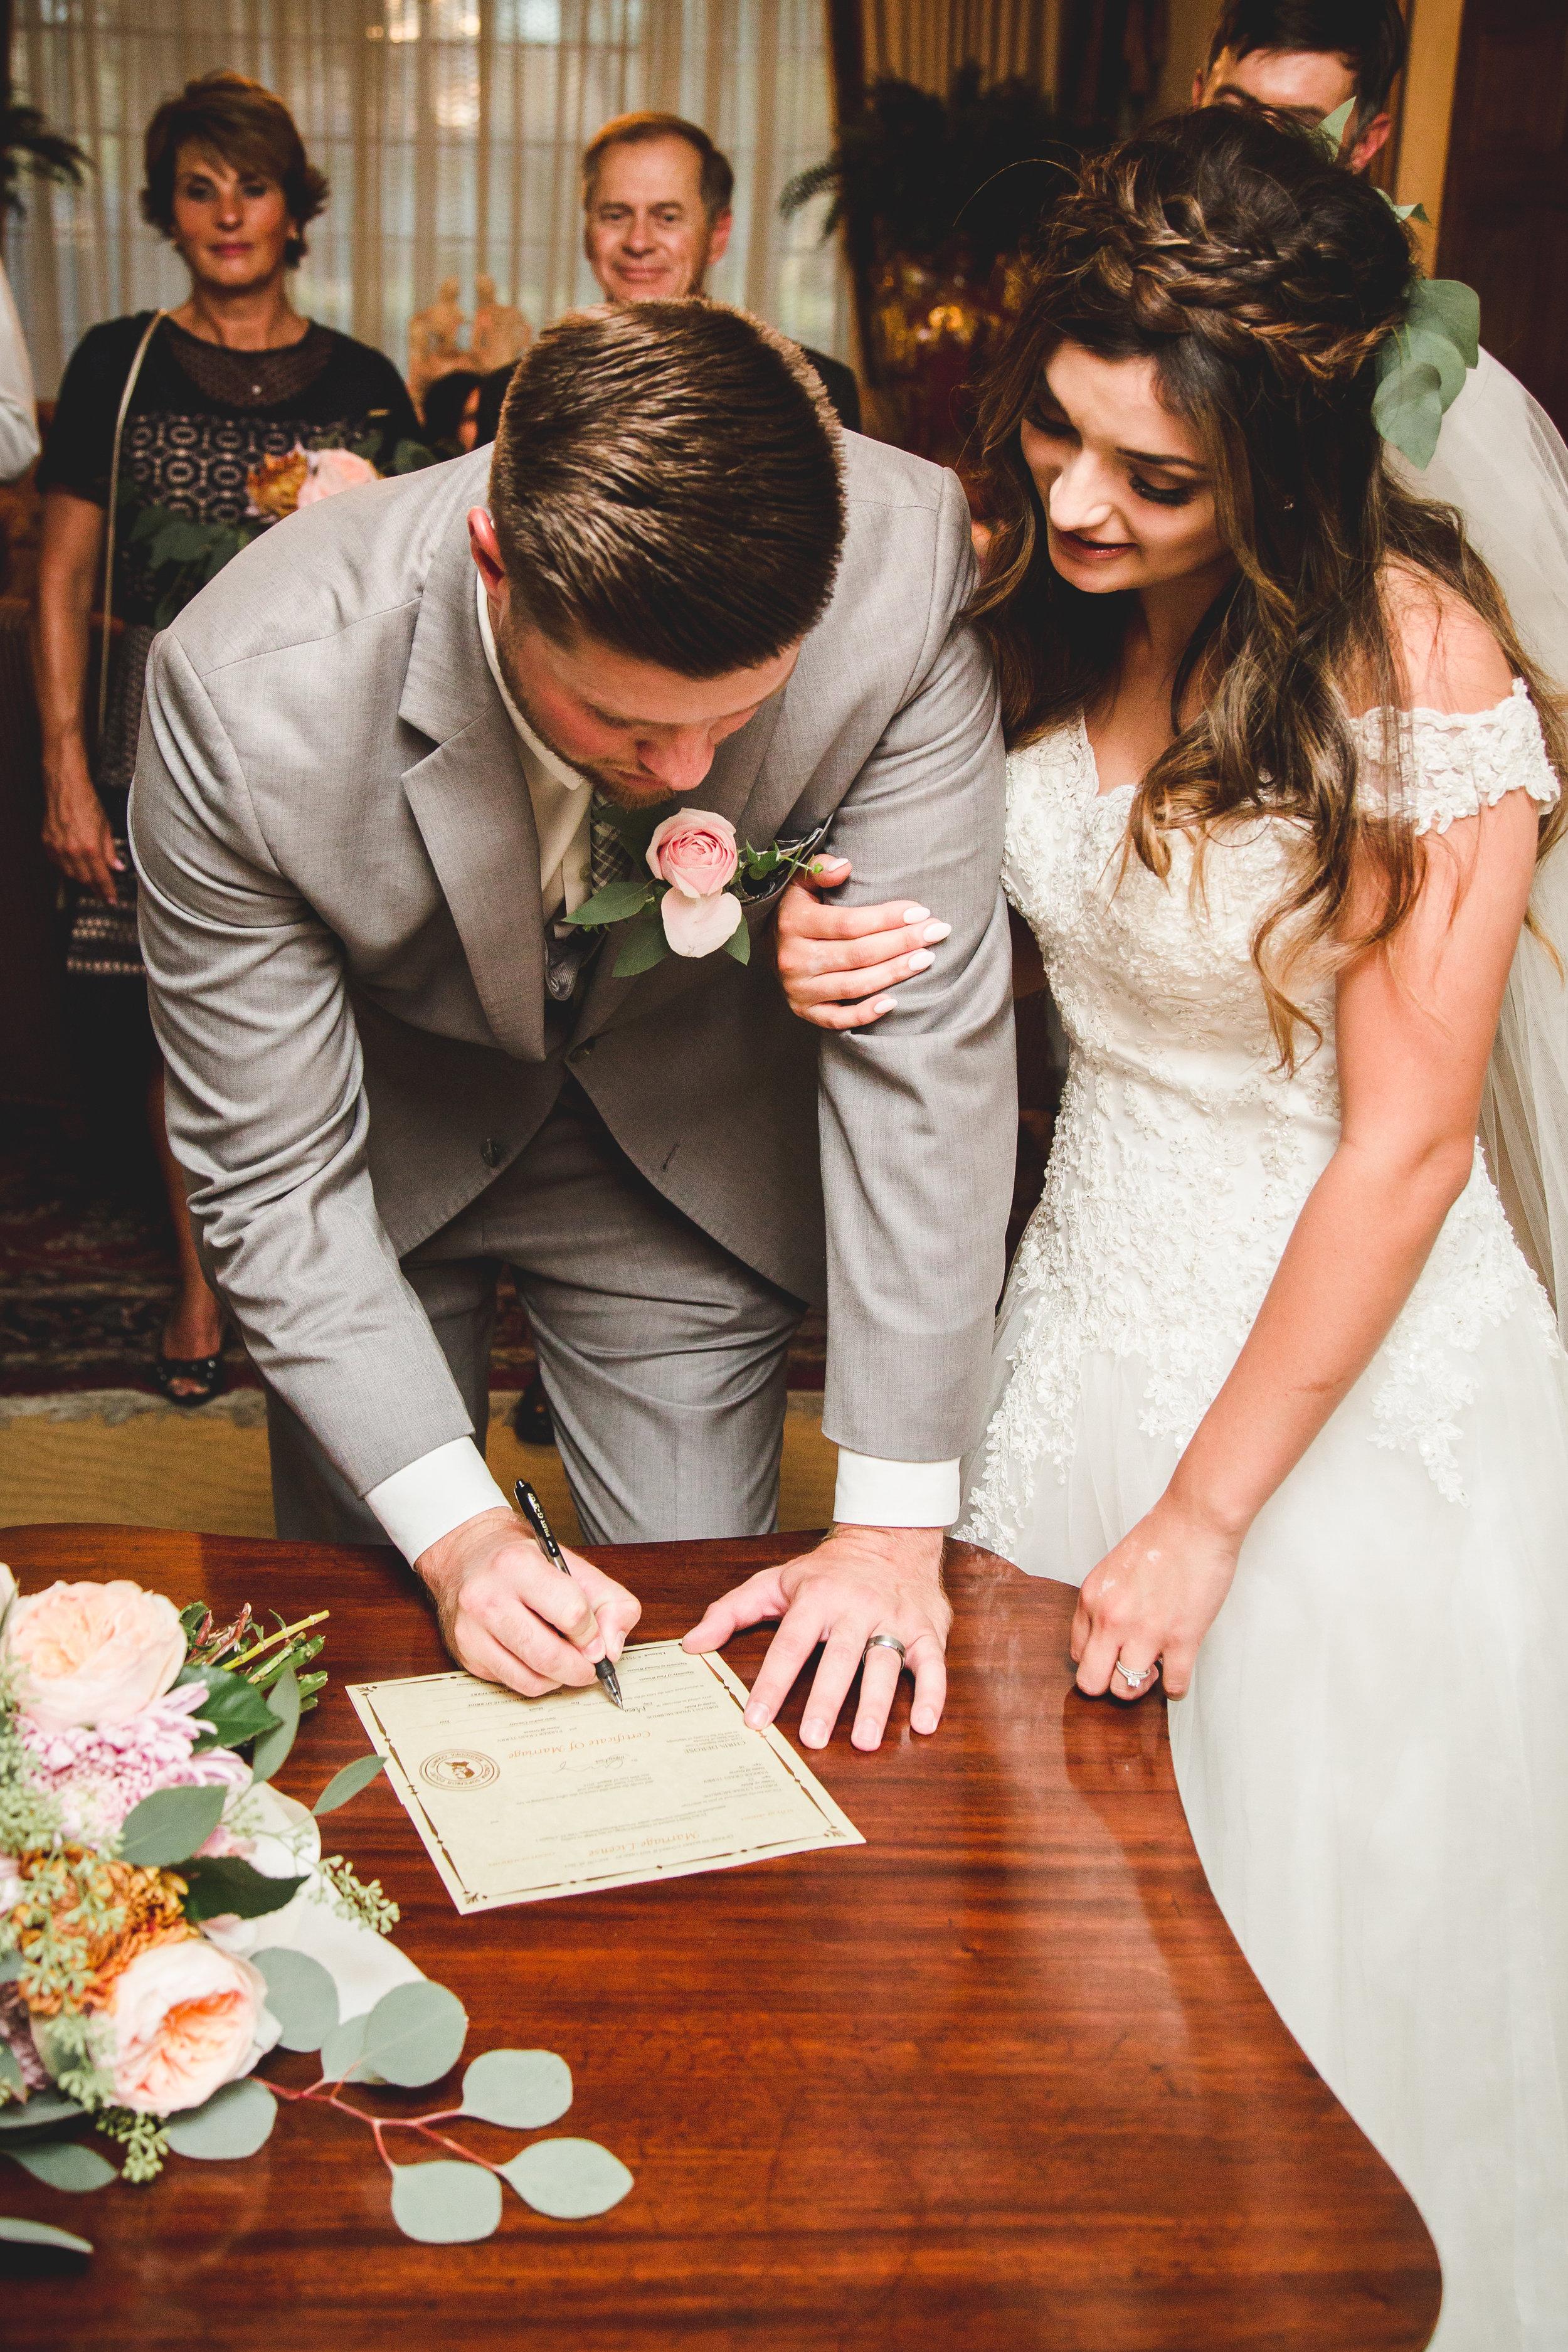 2018-09-07-WEDDING-MCBRIDE-TERRY-222.jpg